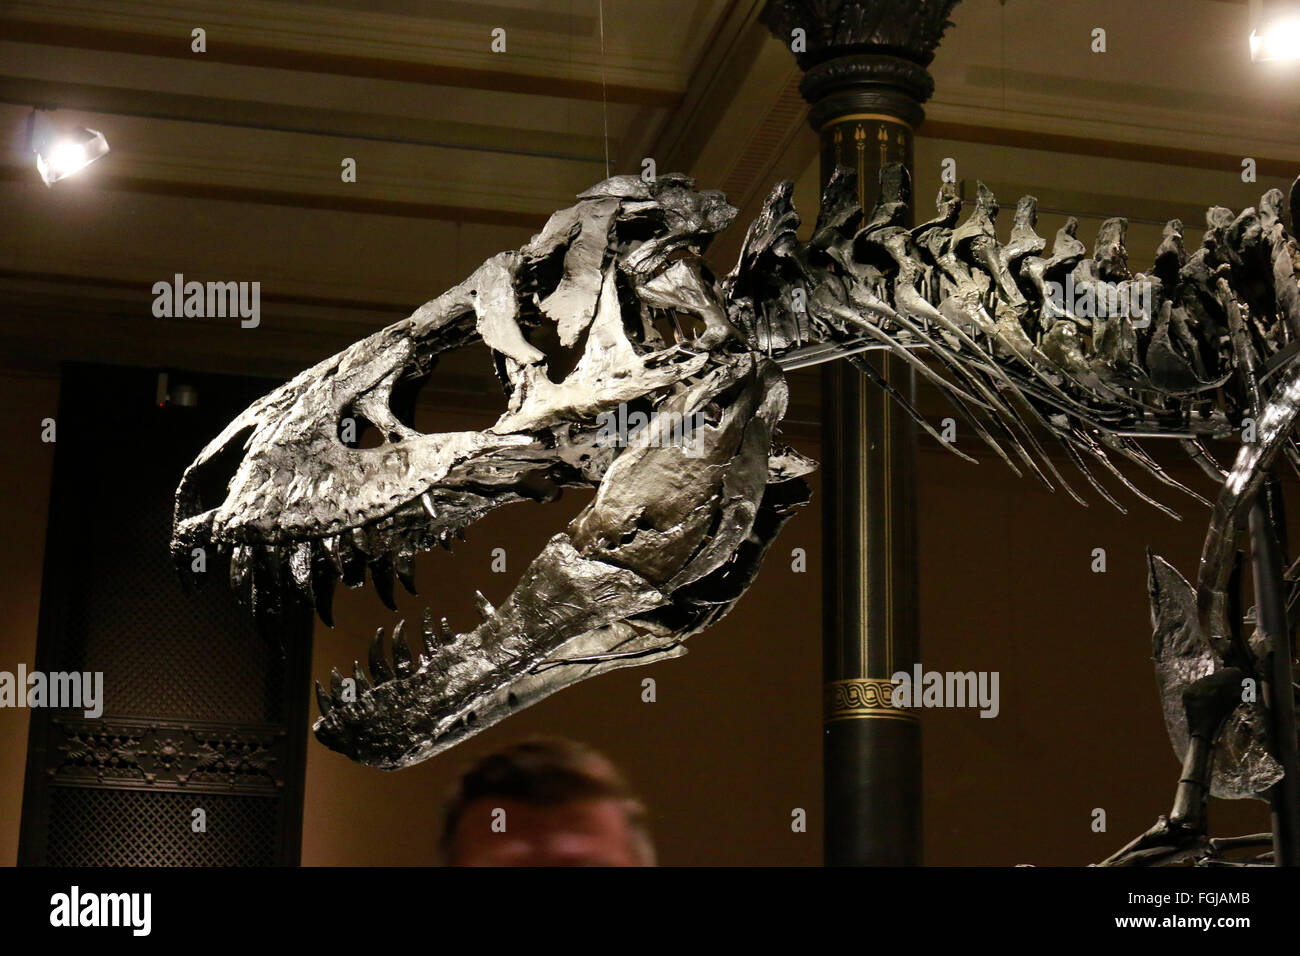 Saurus stock photos saurus stock images alamy das skelett des tyrannus saurus rex tristan otto naturhistorisches museum berlin thecheapjerseys Image collections